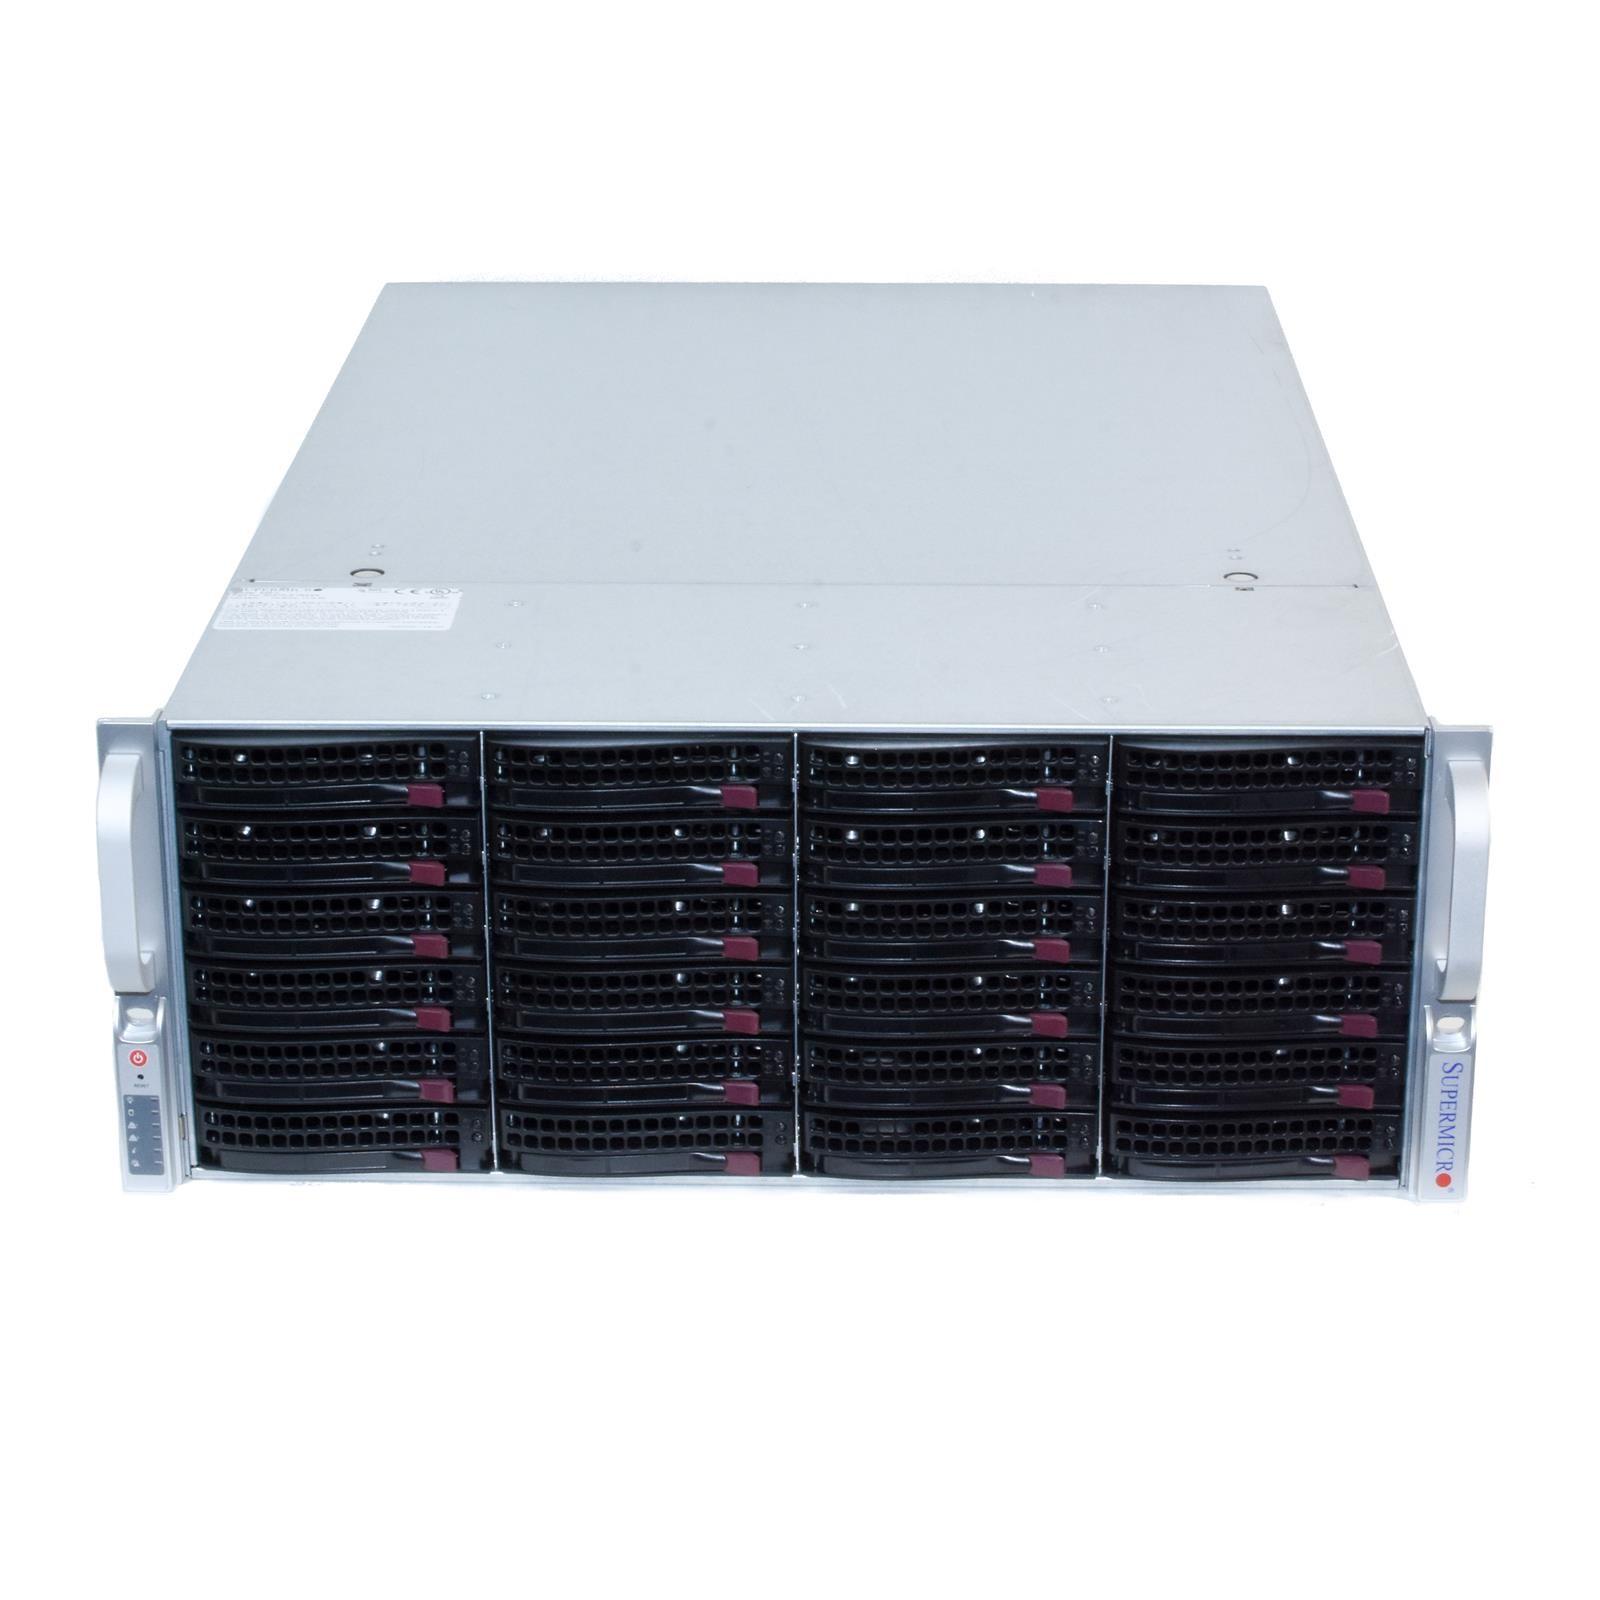 Supermicro CSE-846BE16-R920B 4U Server Chassis 2x 920W 24